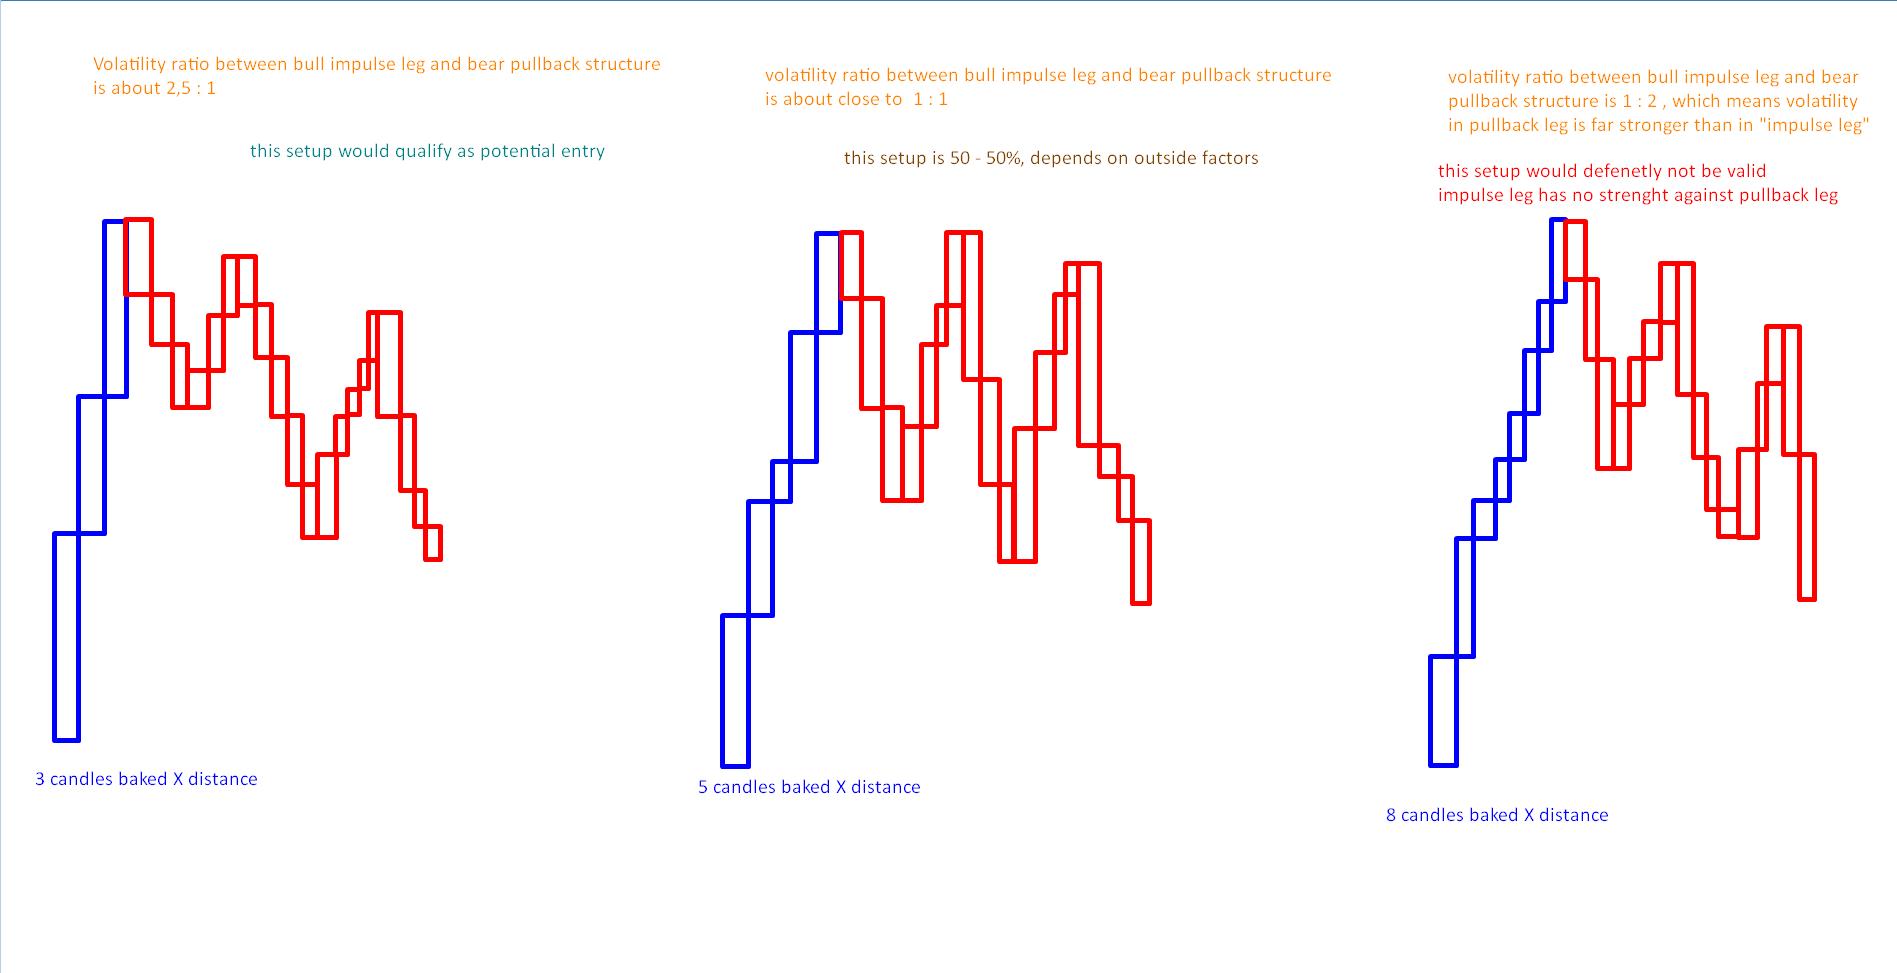 charvo replies to market bottom rotation trading line chart bar chart [ 1897 x 973 Pixel ]